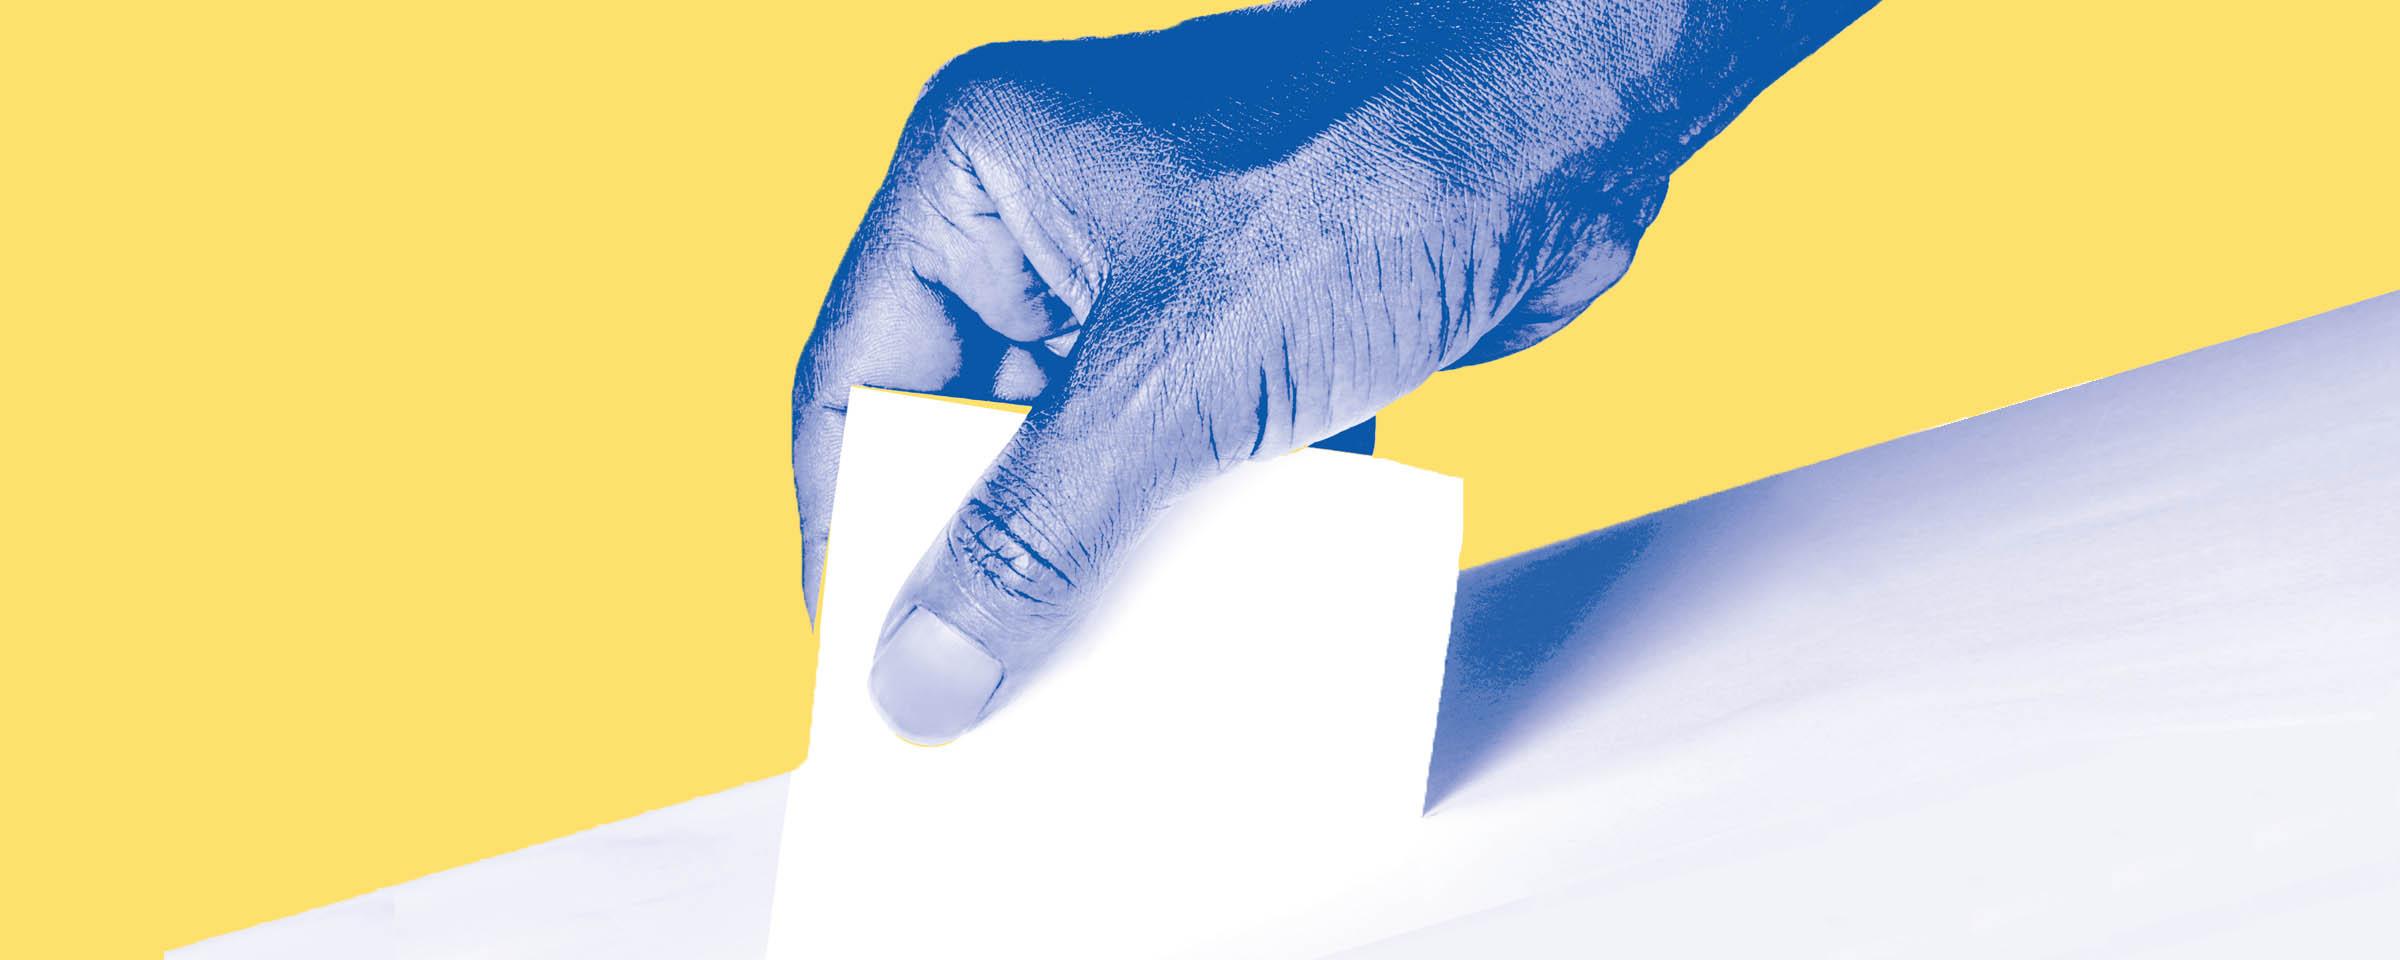 Person slipping their vote into a ballot box